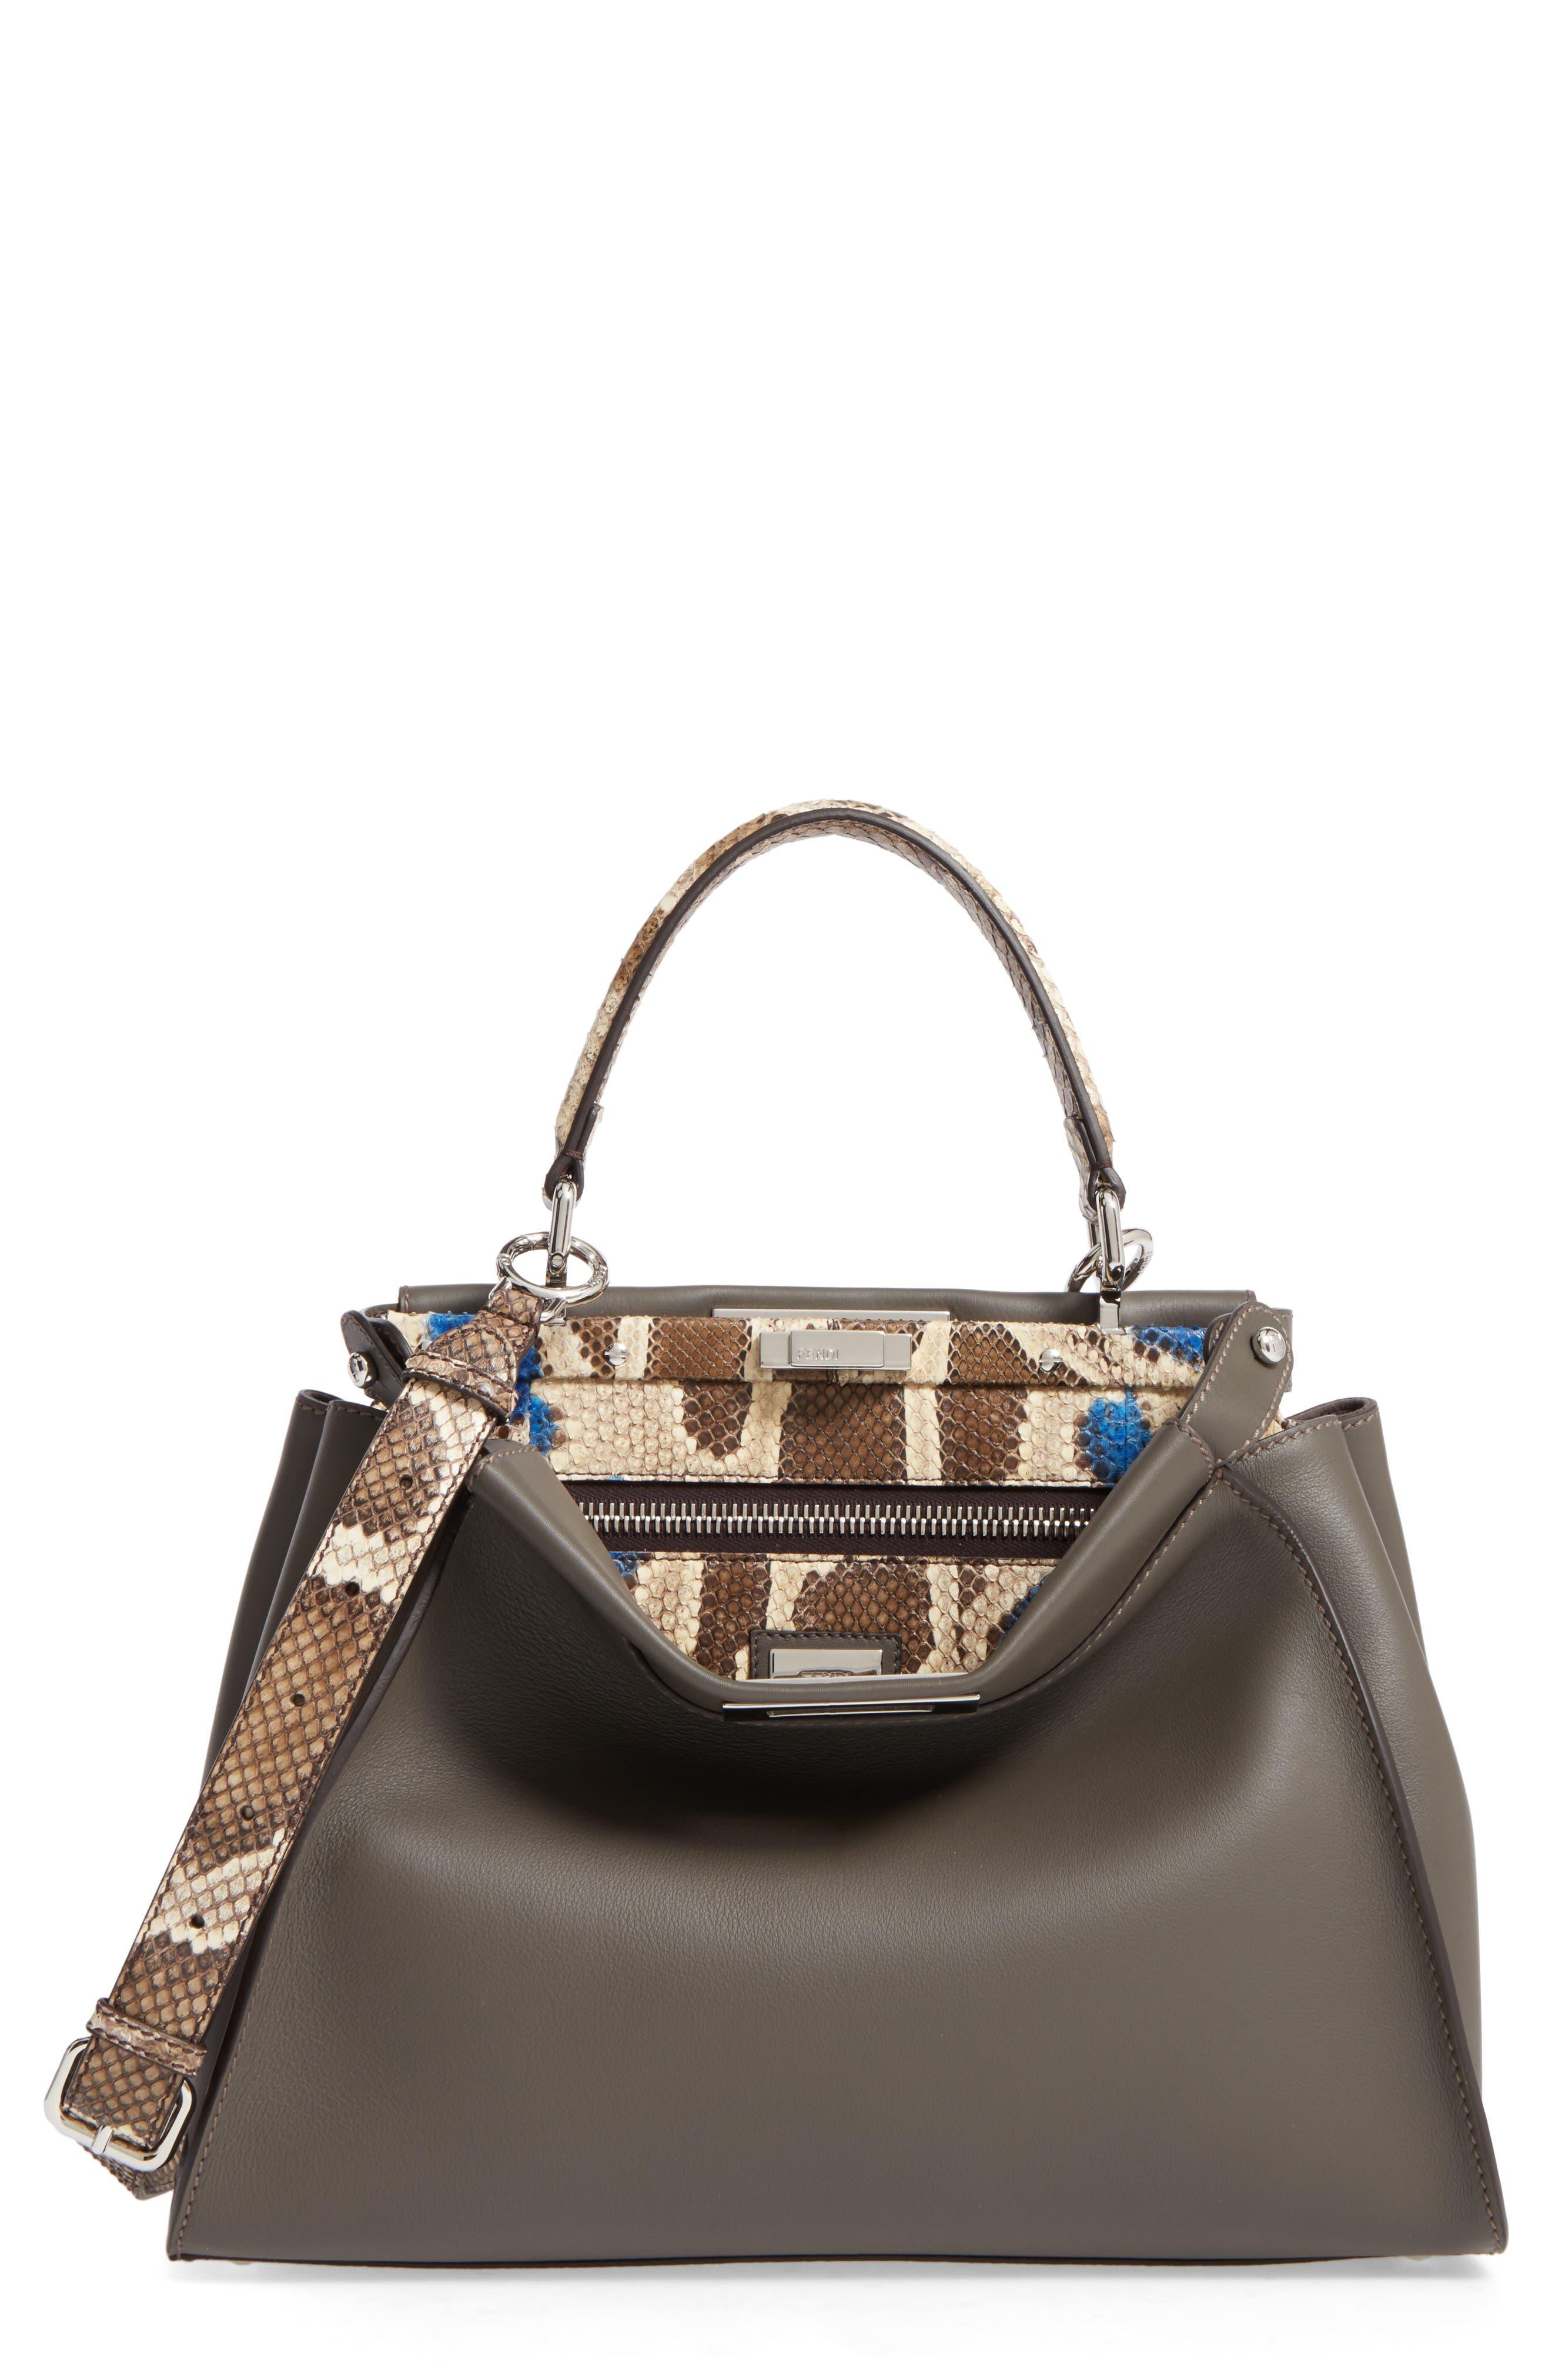 Alternate Image 1 Selected - Fendi Peekaboo Calfskin Leather & Genuine Python Satchel